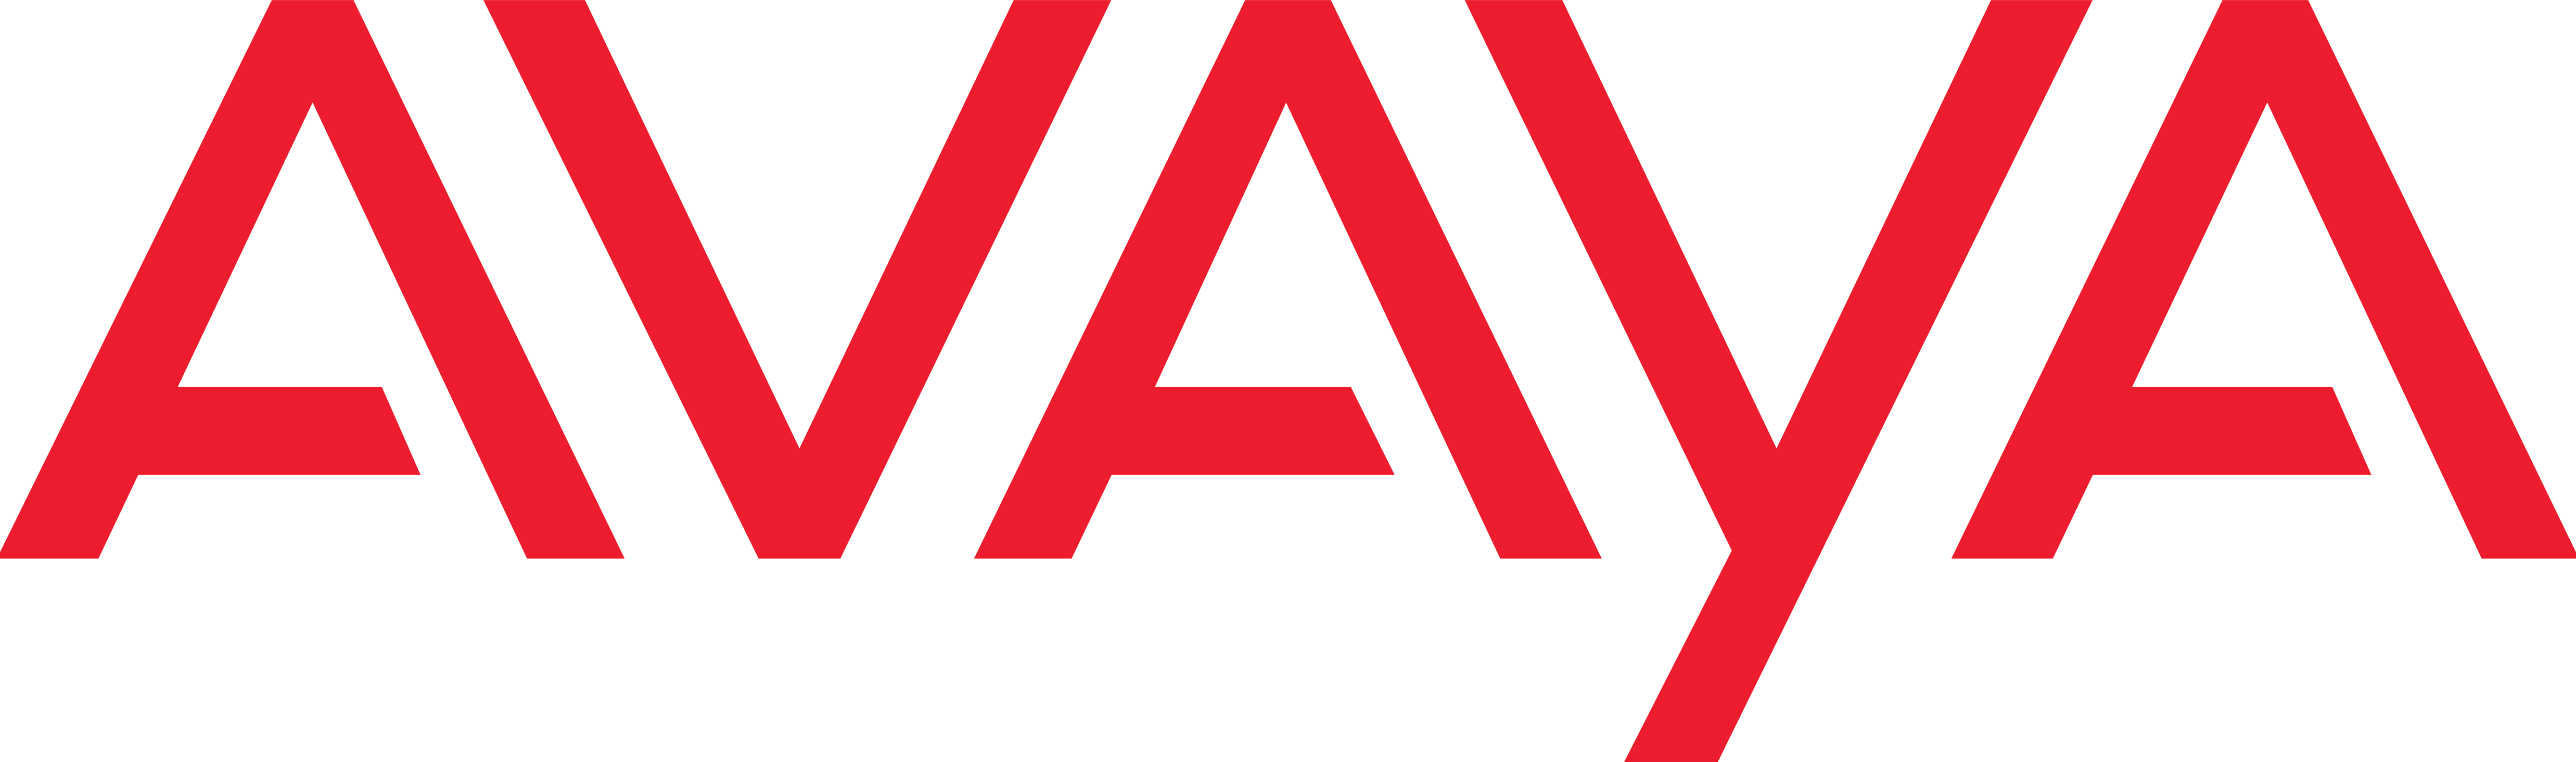 Avaya-PBX